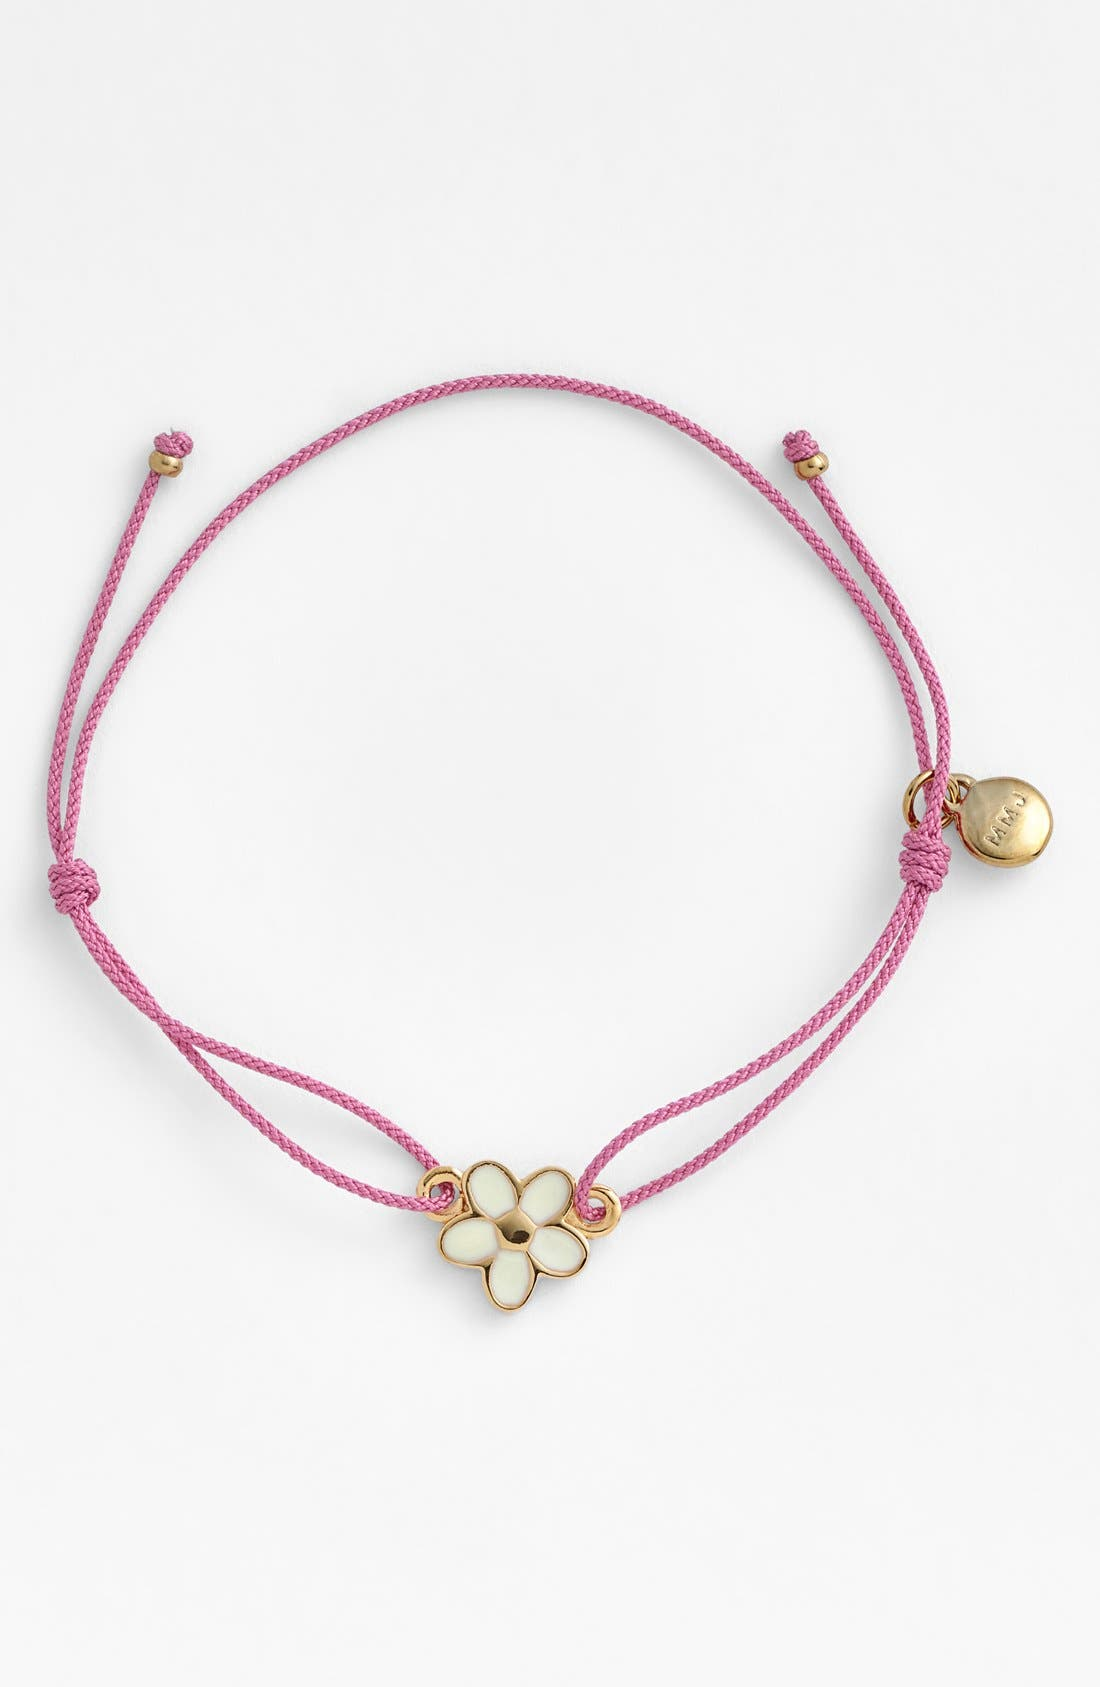 Alternate Image 1 Selected - MARC BY MARC JACOBS Flower Friendship Bracelet